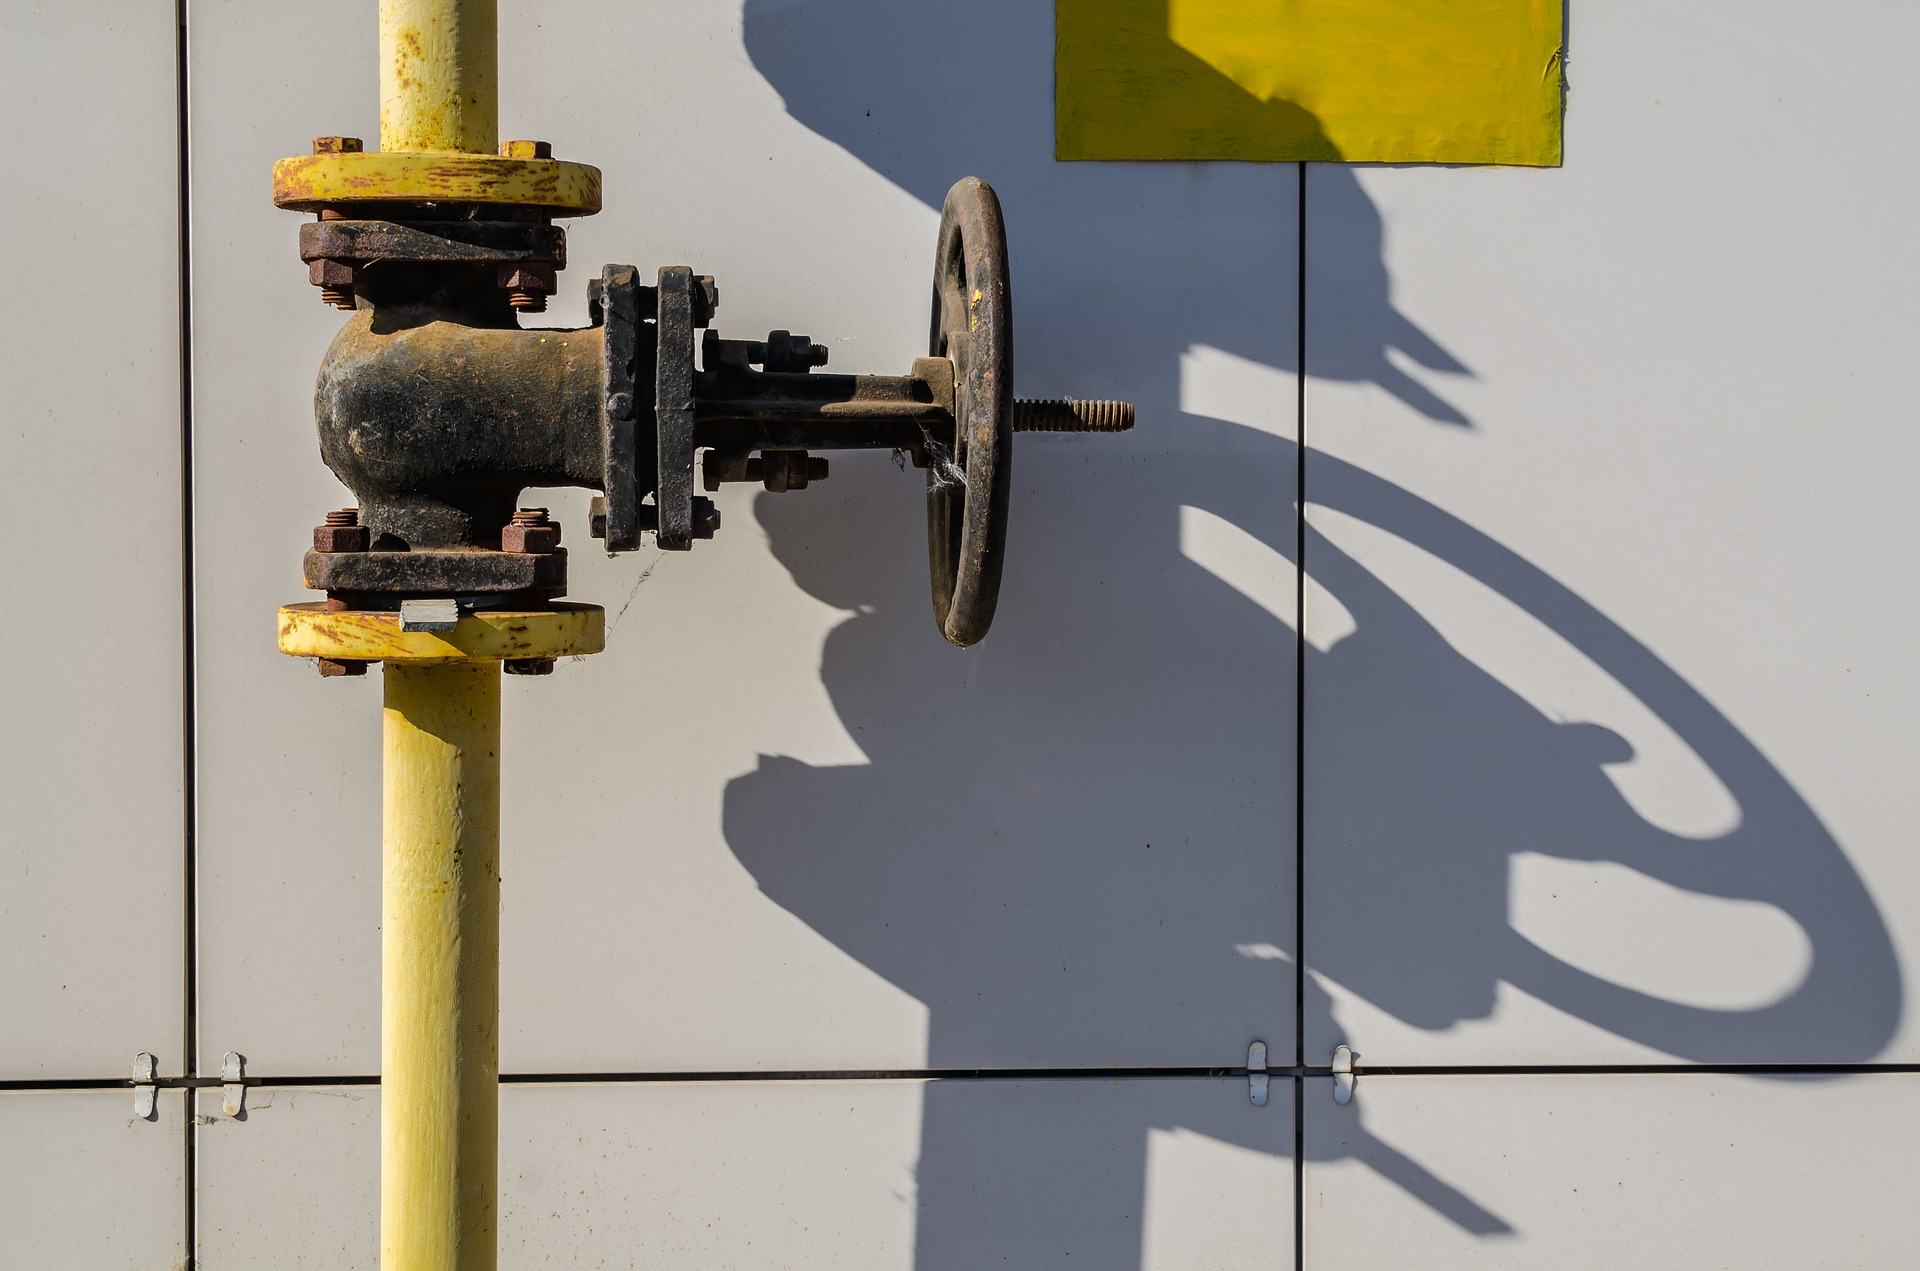 valve-4835969_1920